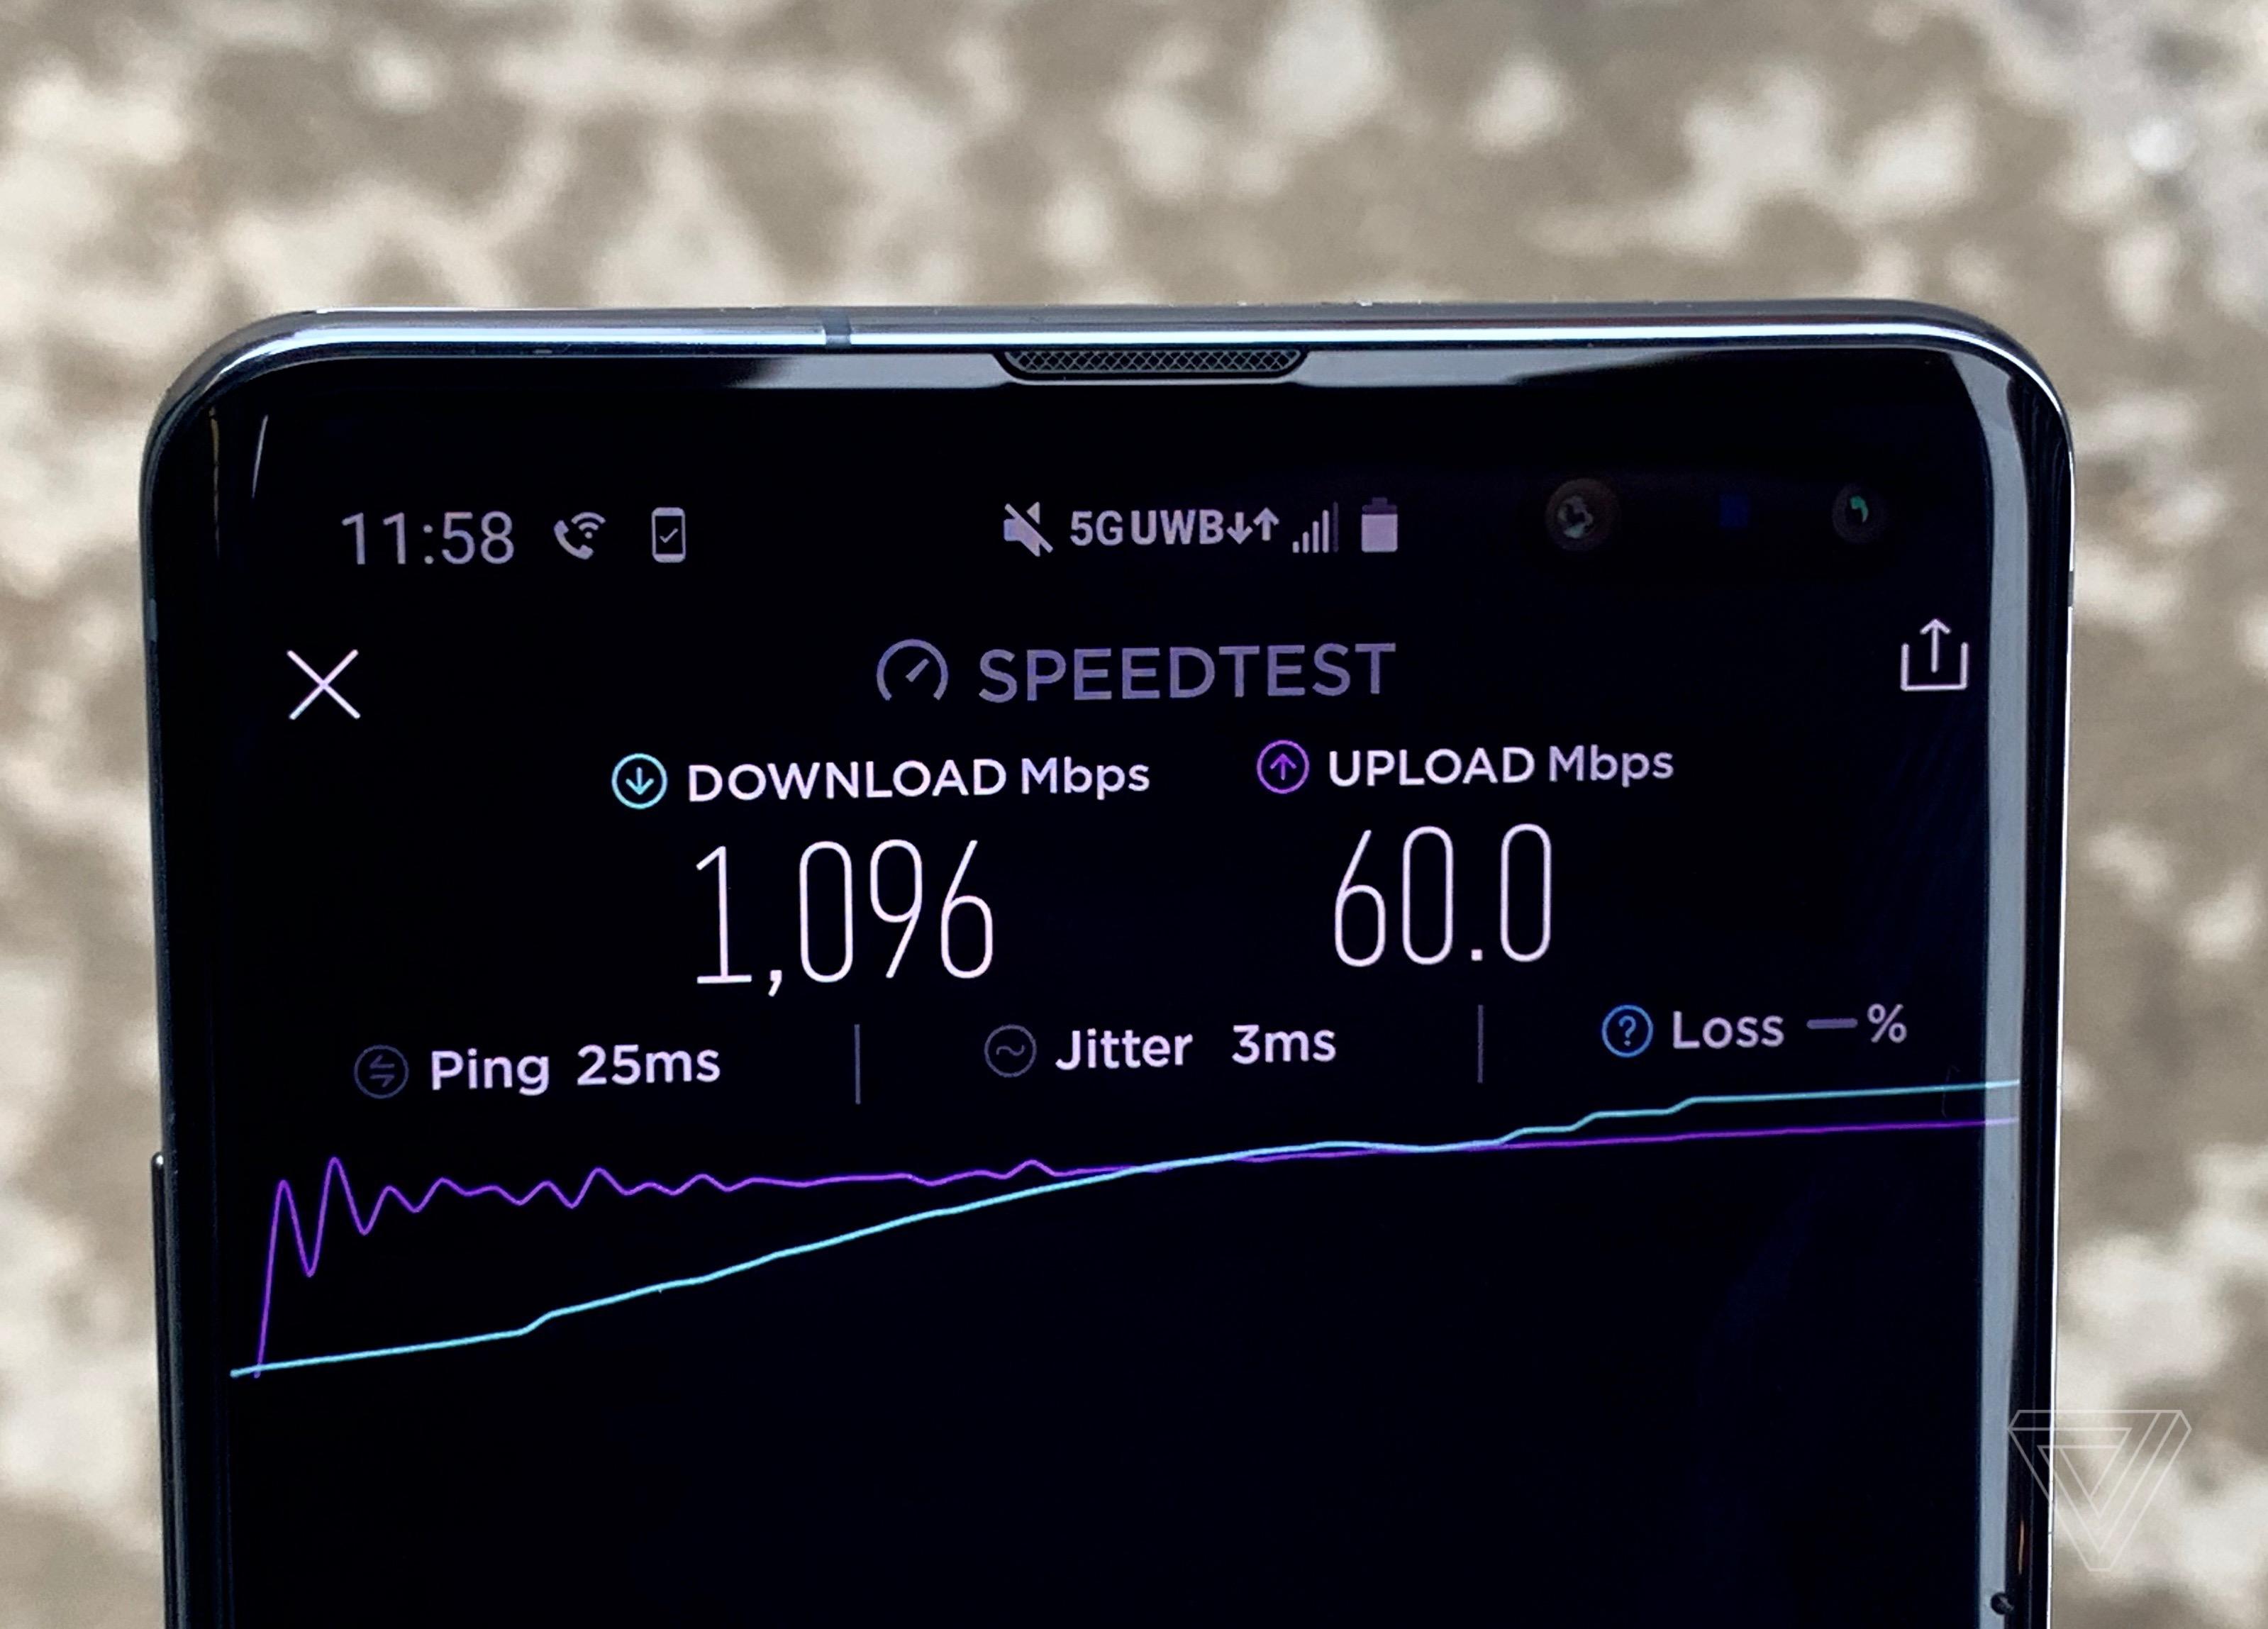 Verizon's 5G network is now hitting gigabit download speeds - The Verge